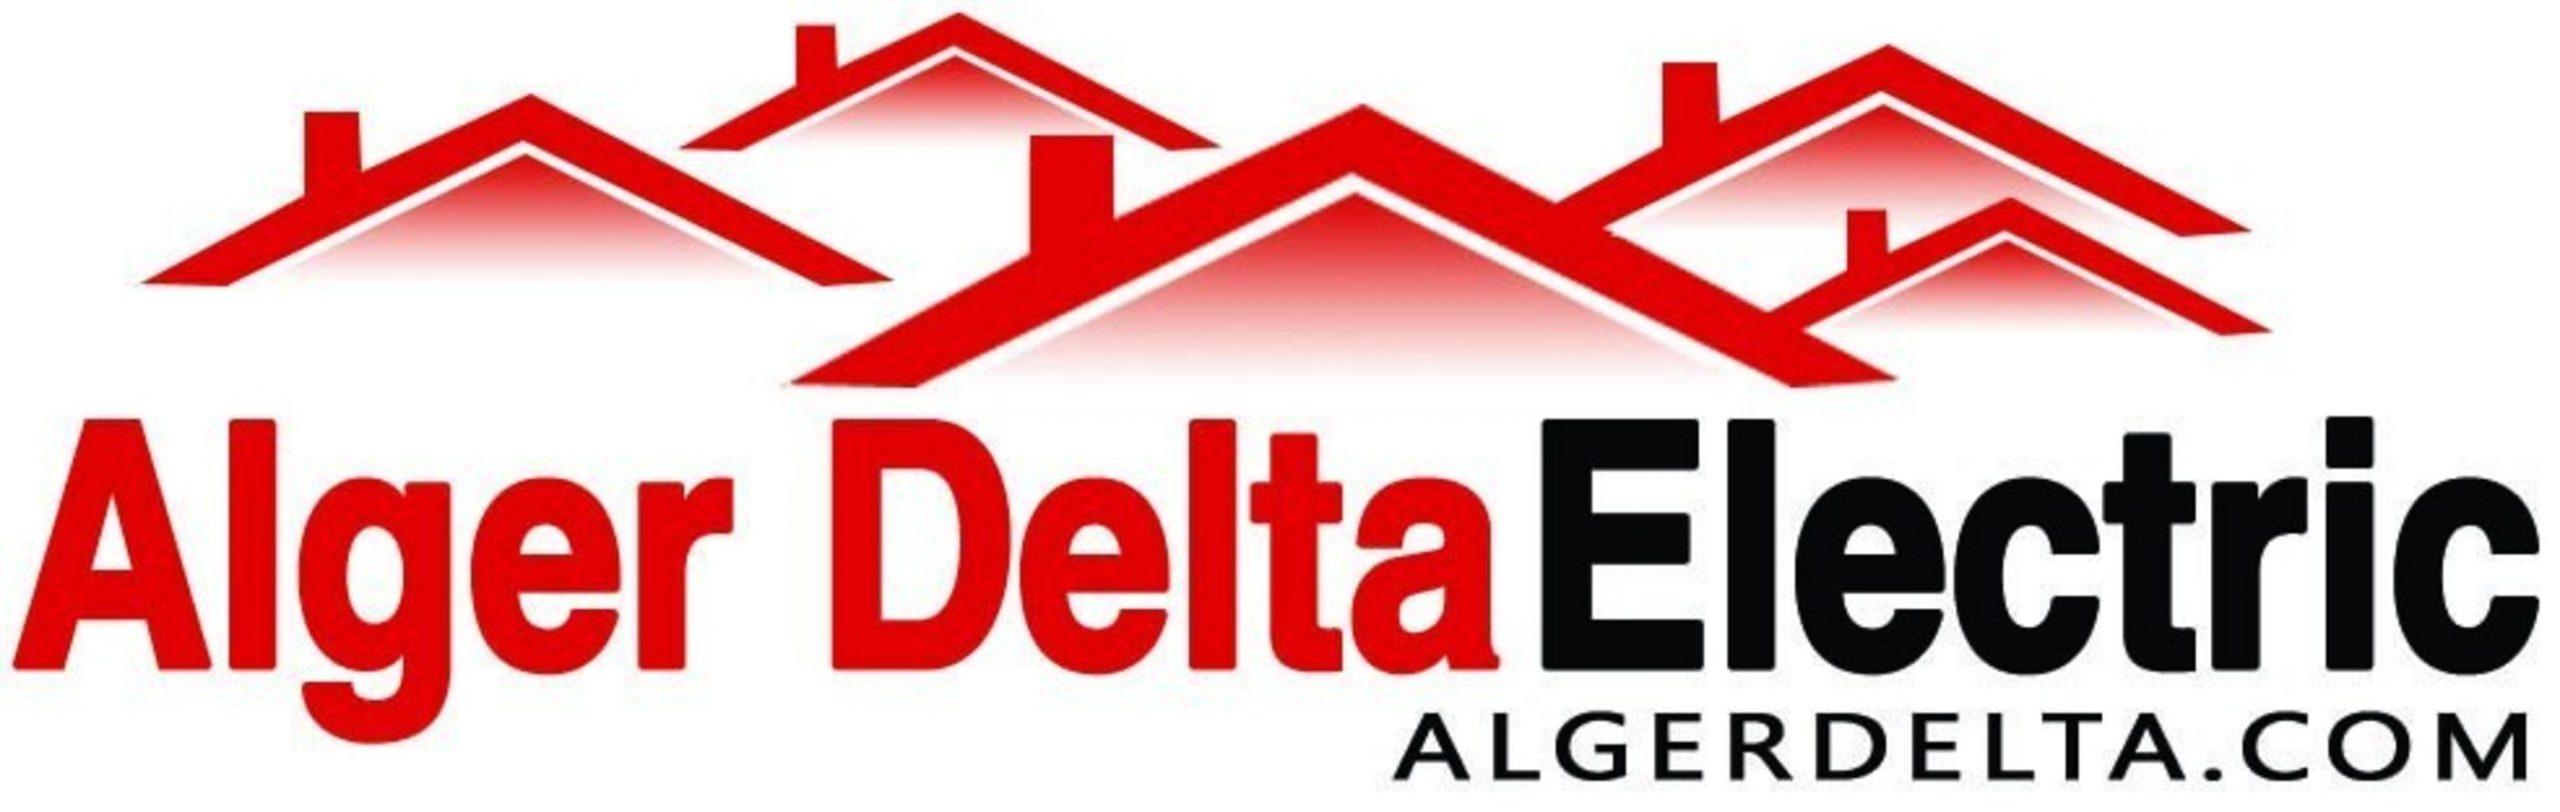 Alger-Delta Co-Op Gets $8 Million Federal Loan